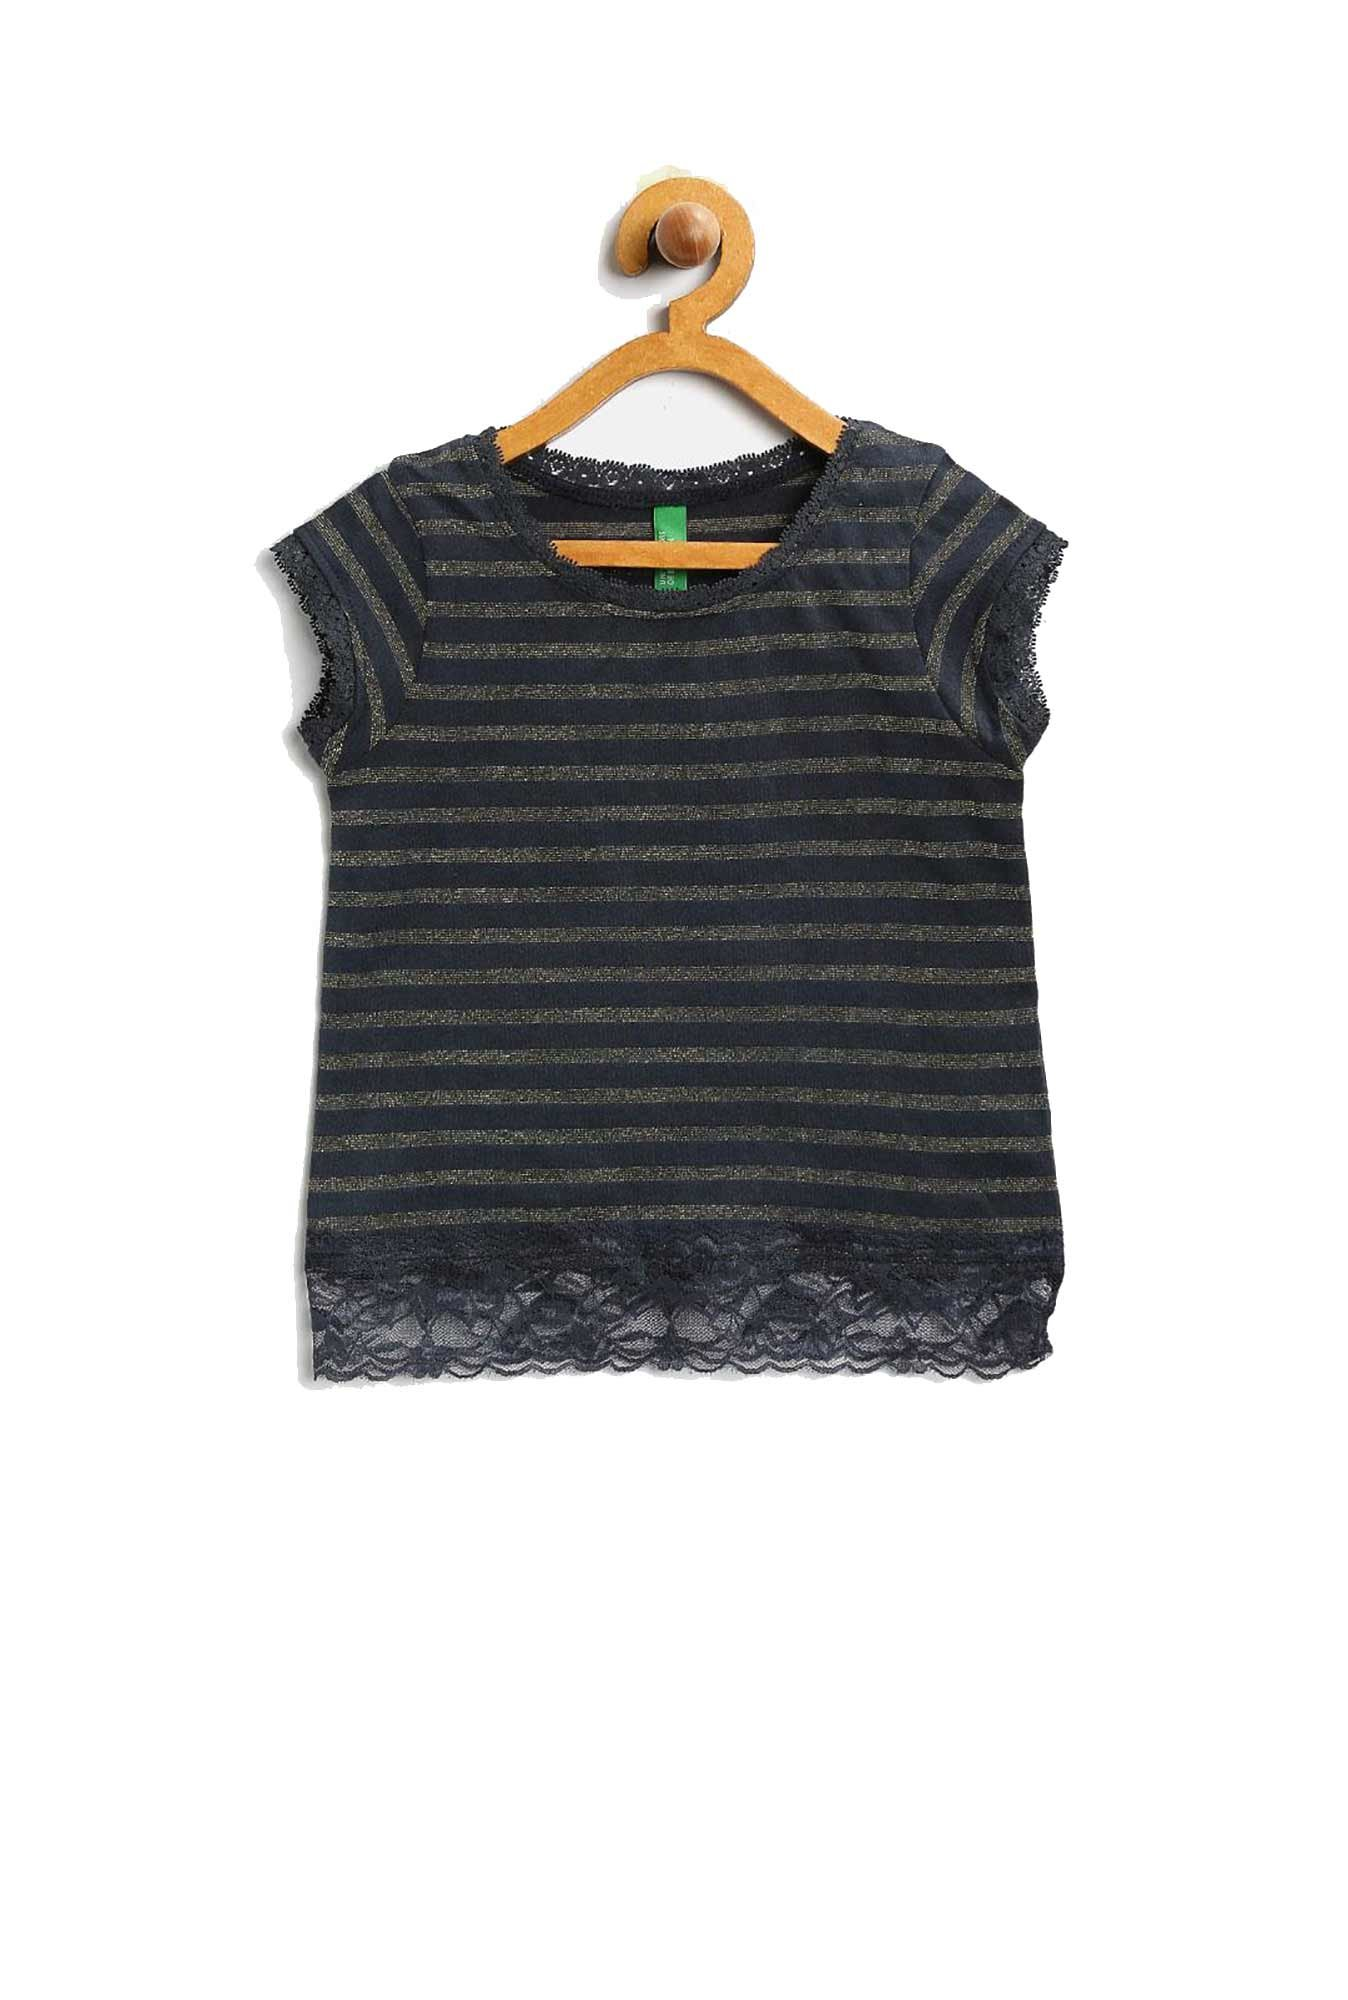 8da80150bd Buy United Colors of Benetton Kids Navy Striped T-Shirt for Girls Clothings  Online @ Tata CLiQ